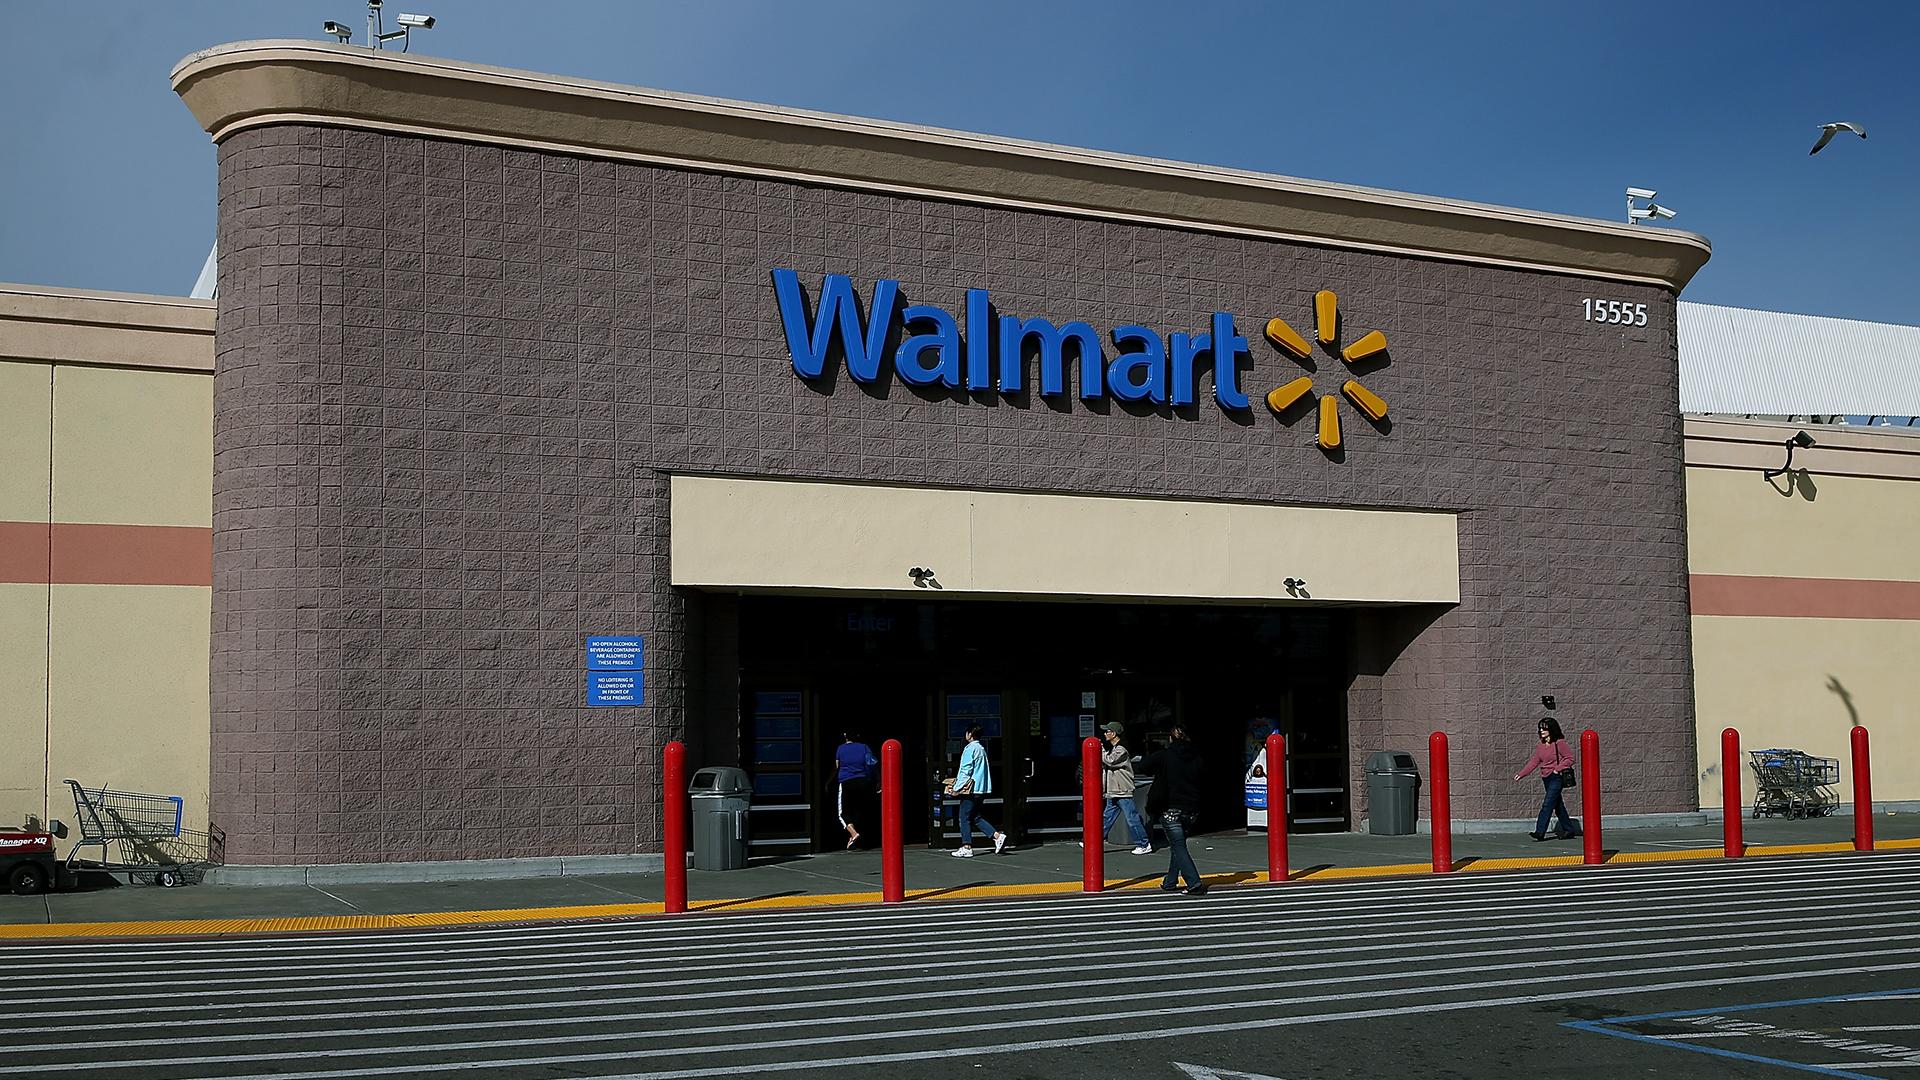 California Walmart store-159532.jpg87948587